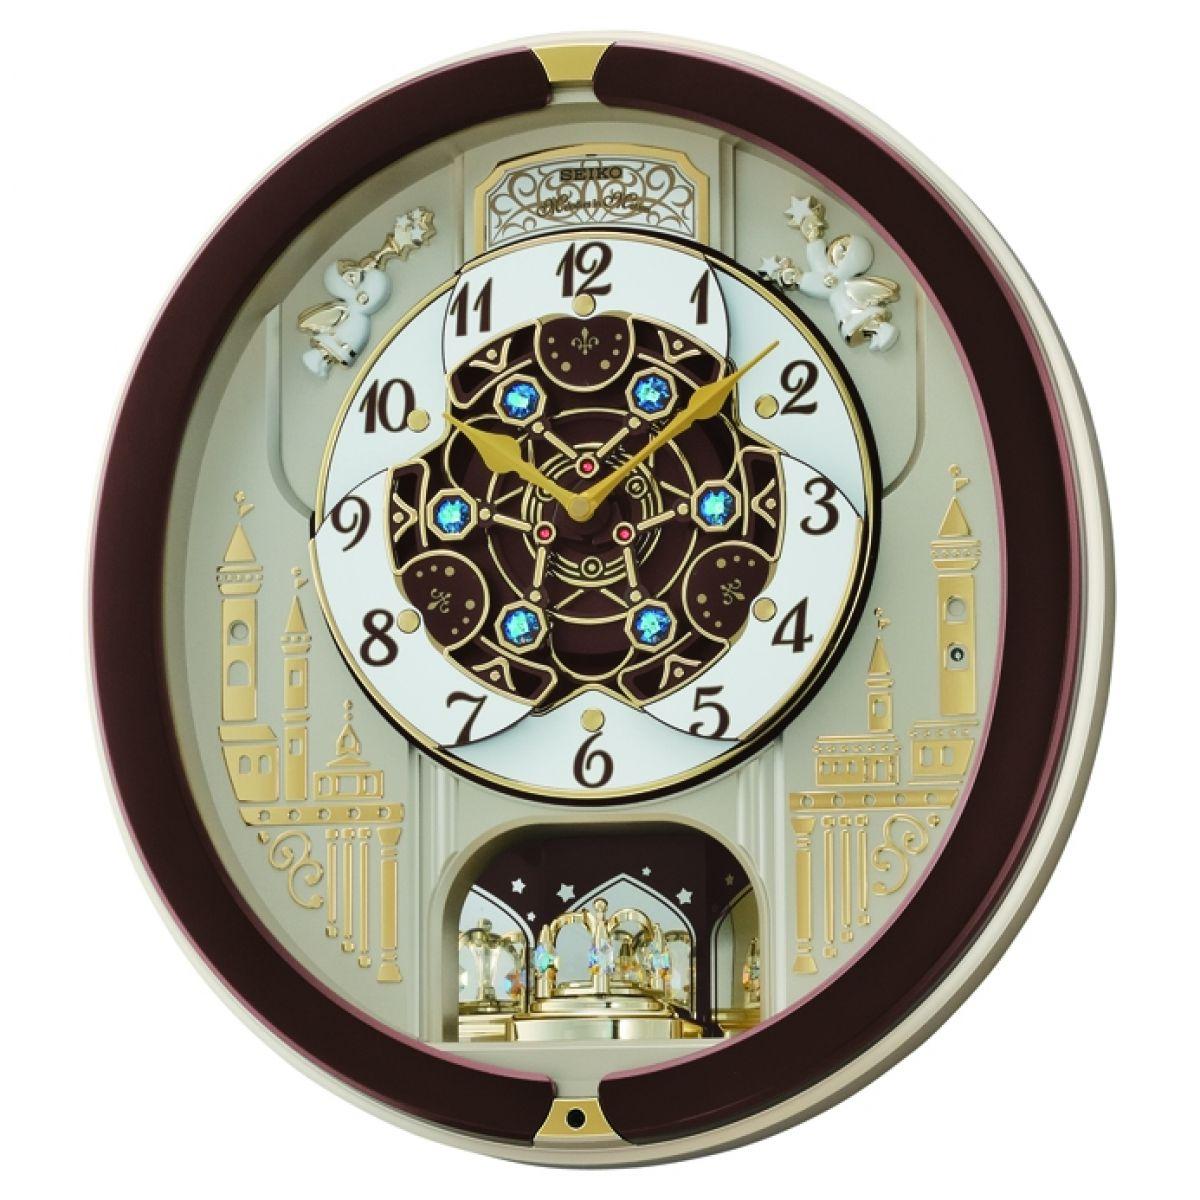 Clock Seiko Clocks Musical Marionette Wall Clock Alarm